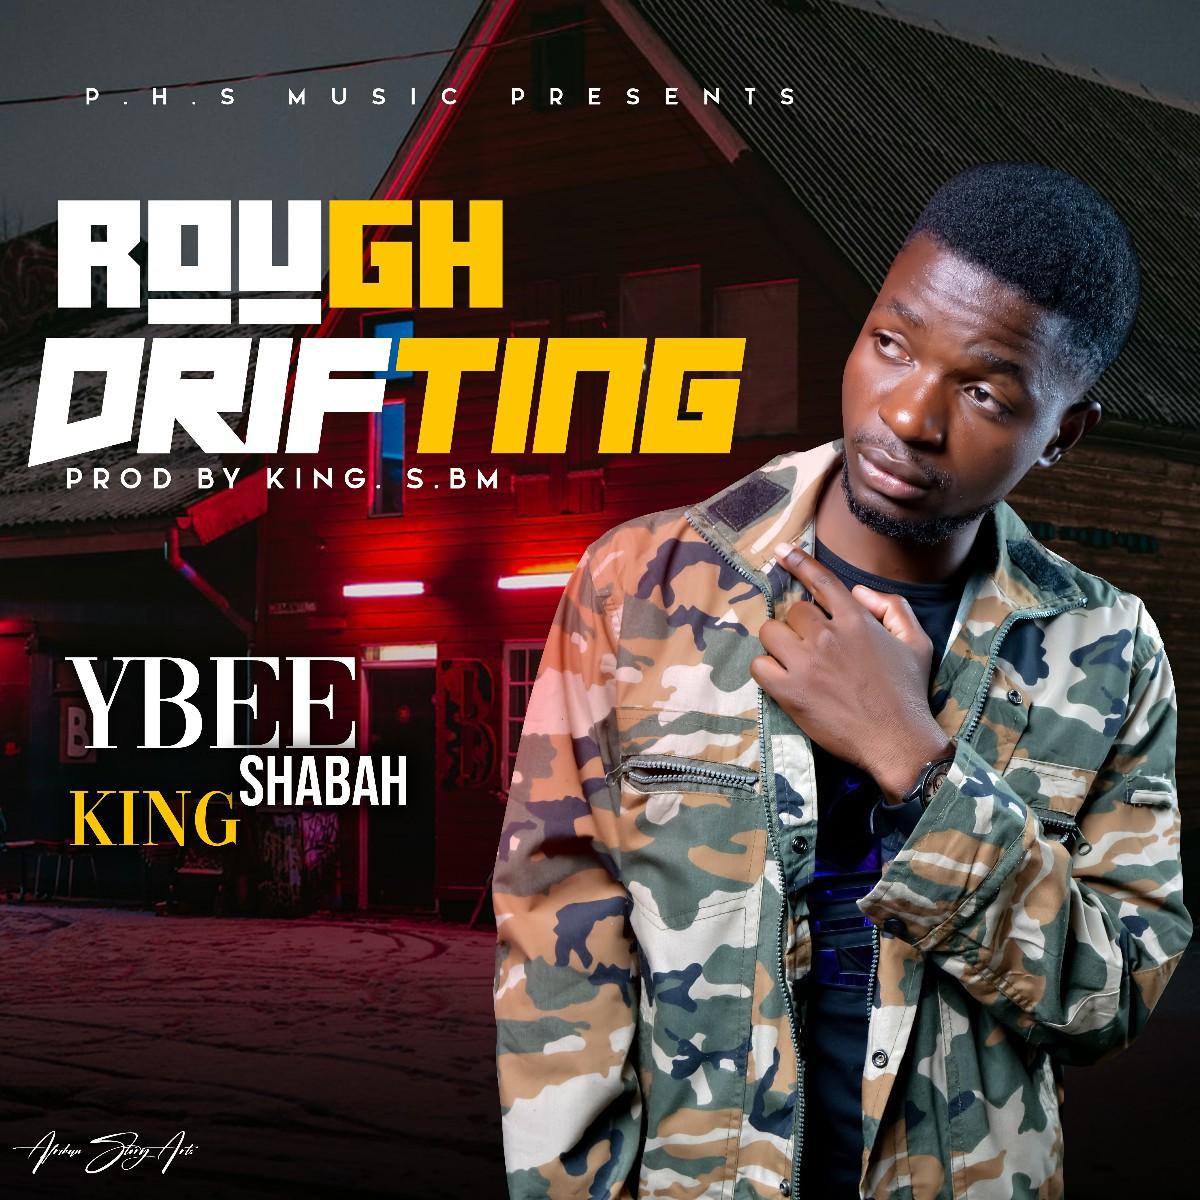 Ybee King Shabah - Rough Drifting